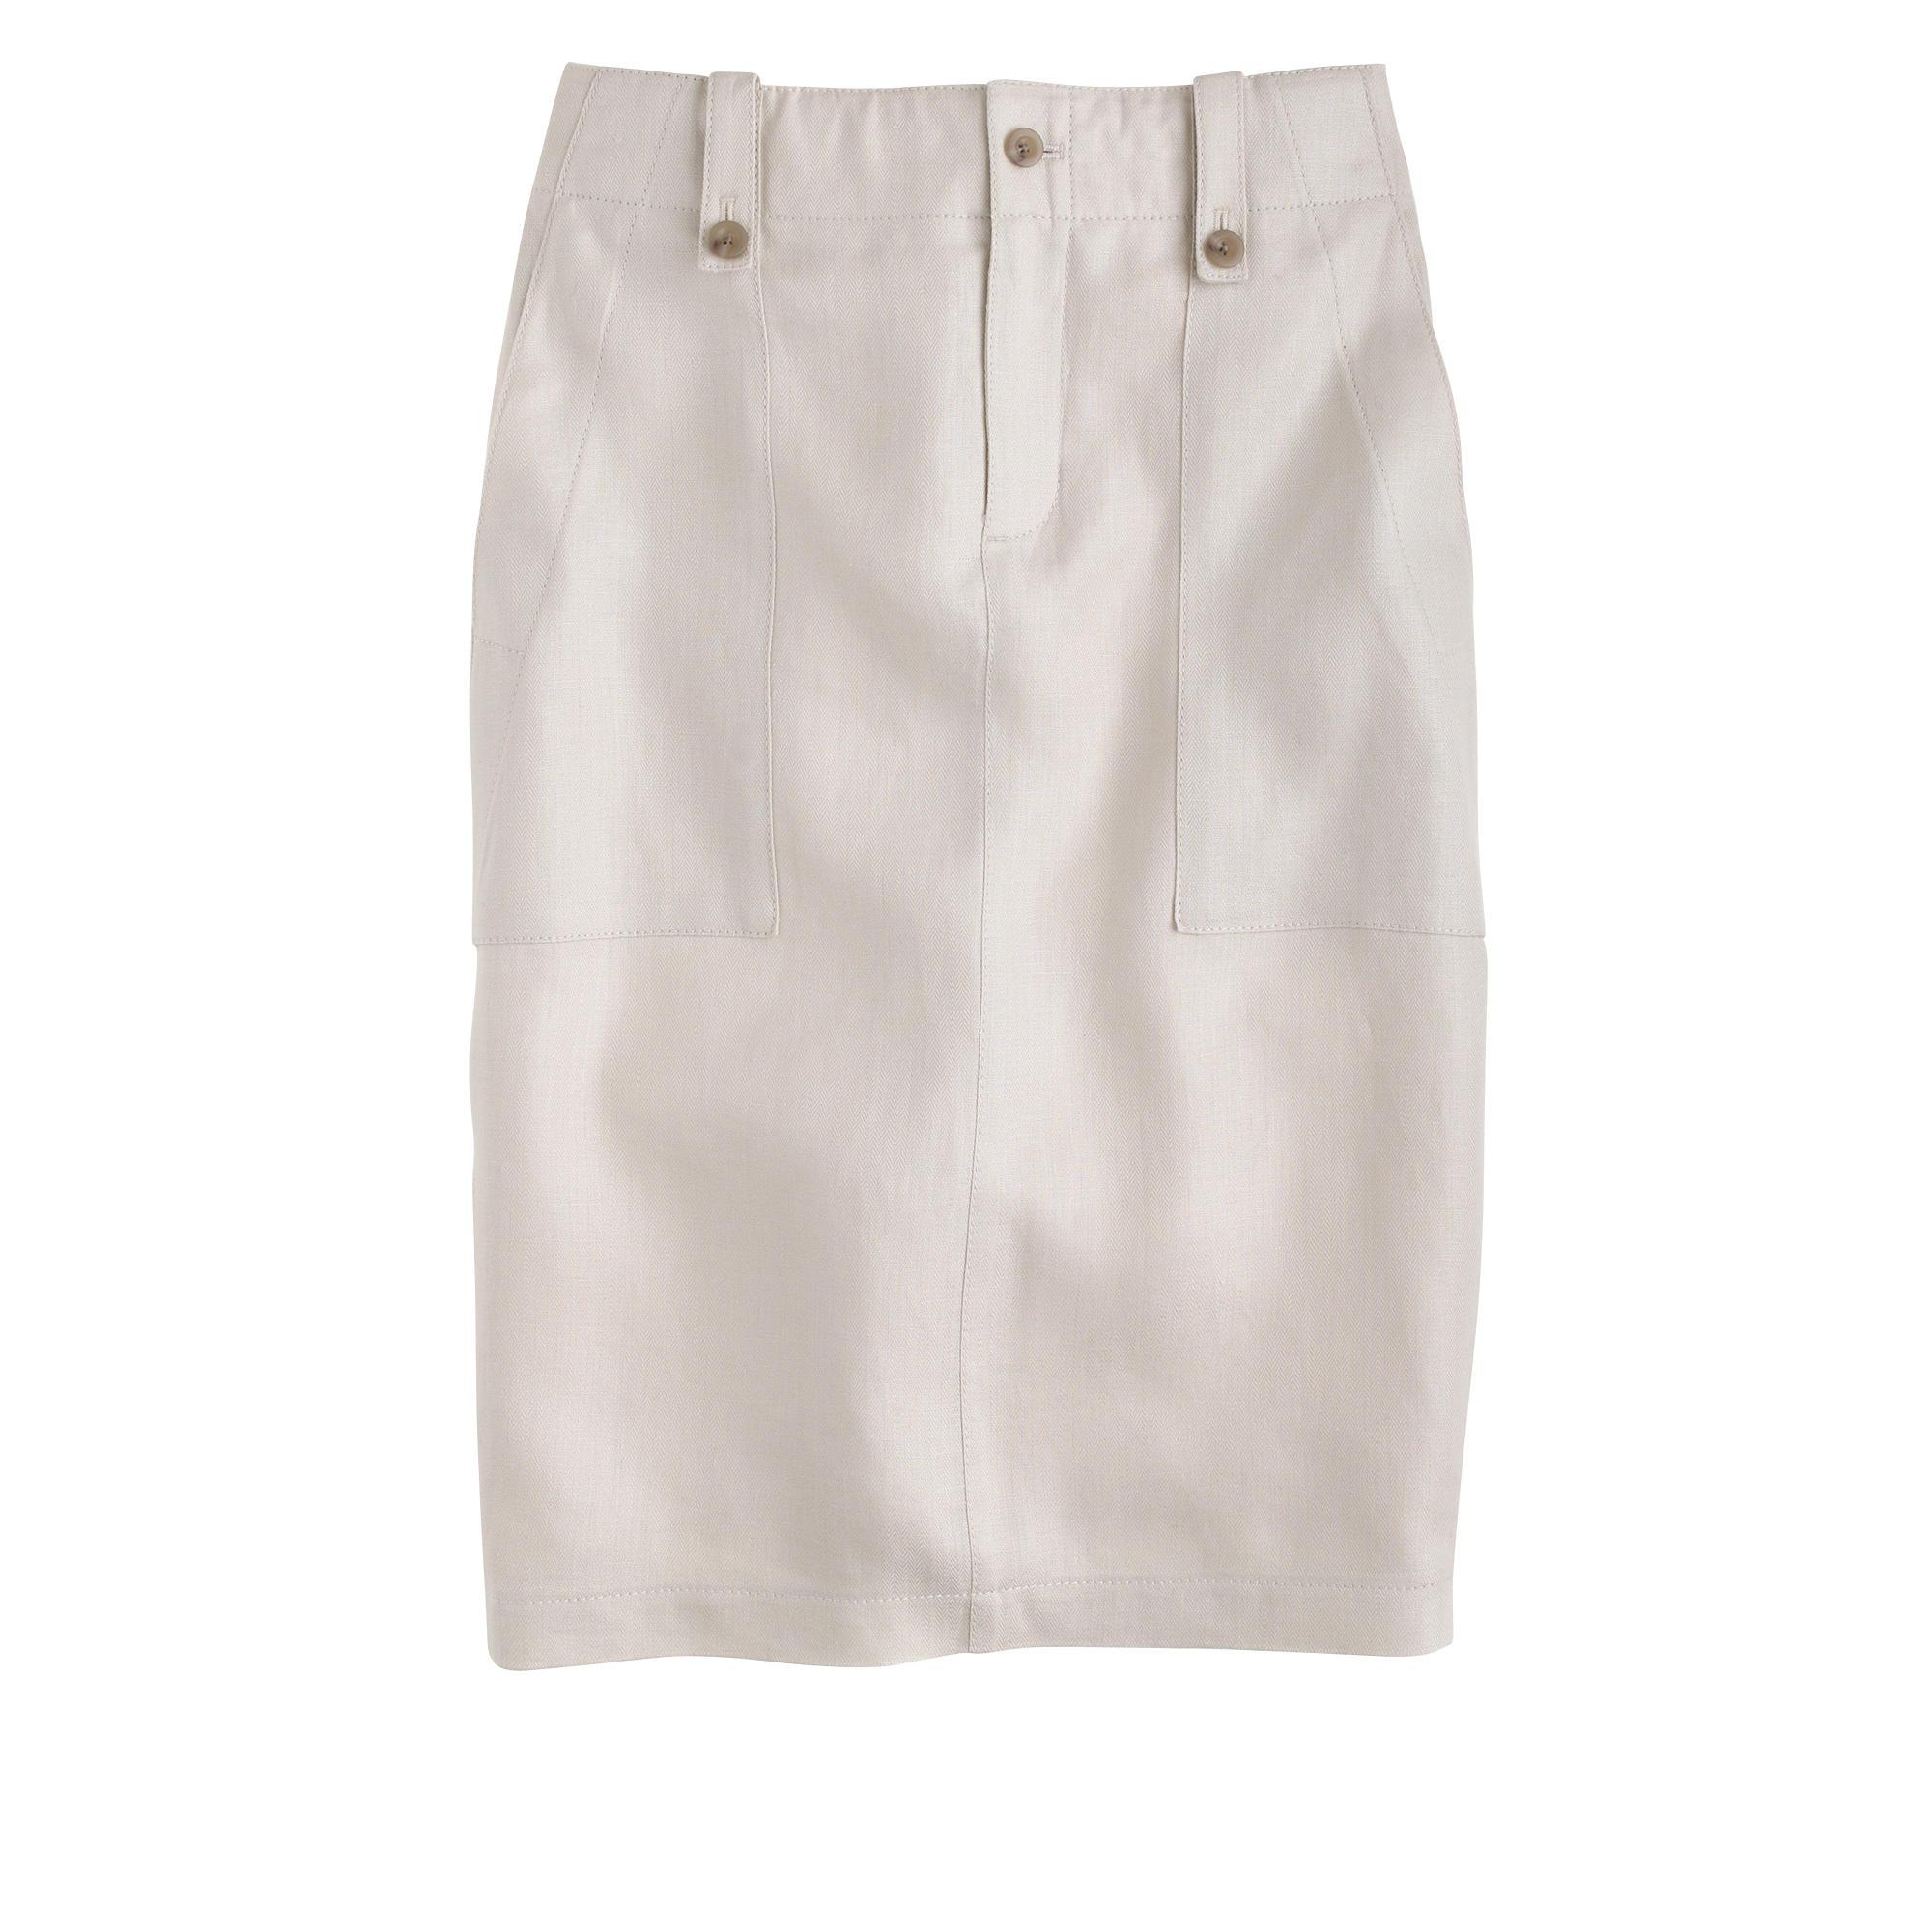 j crew linen cargo pencil skirt in white ecru lyst